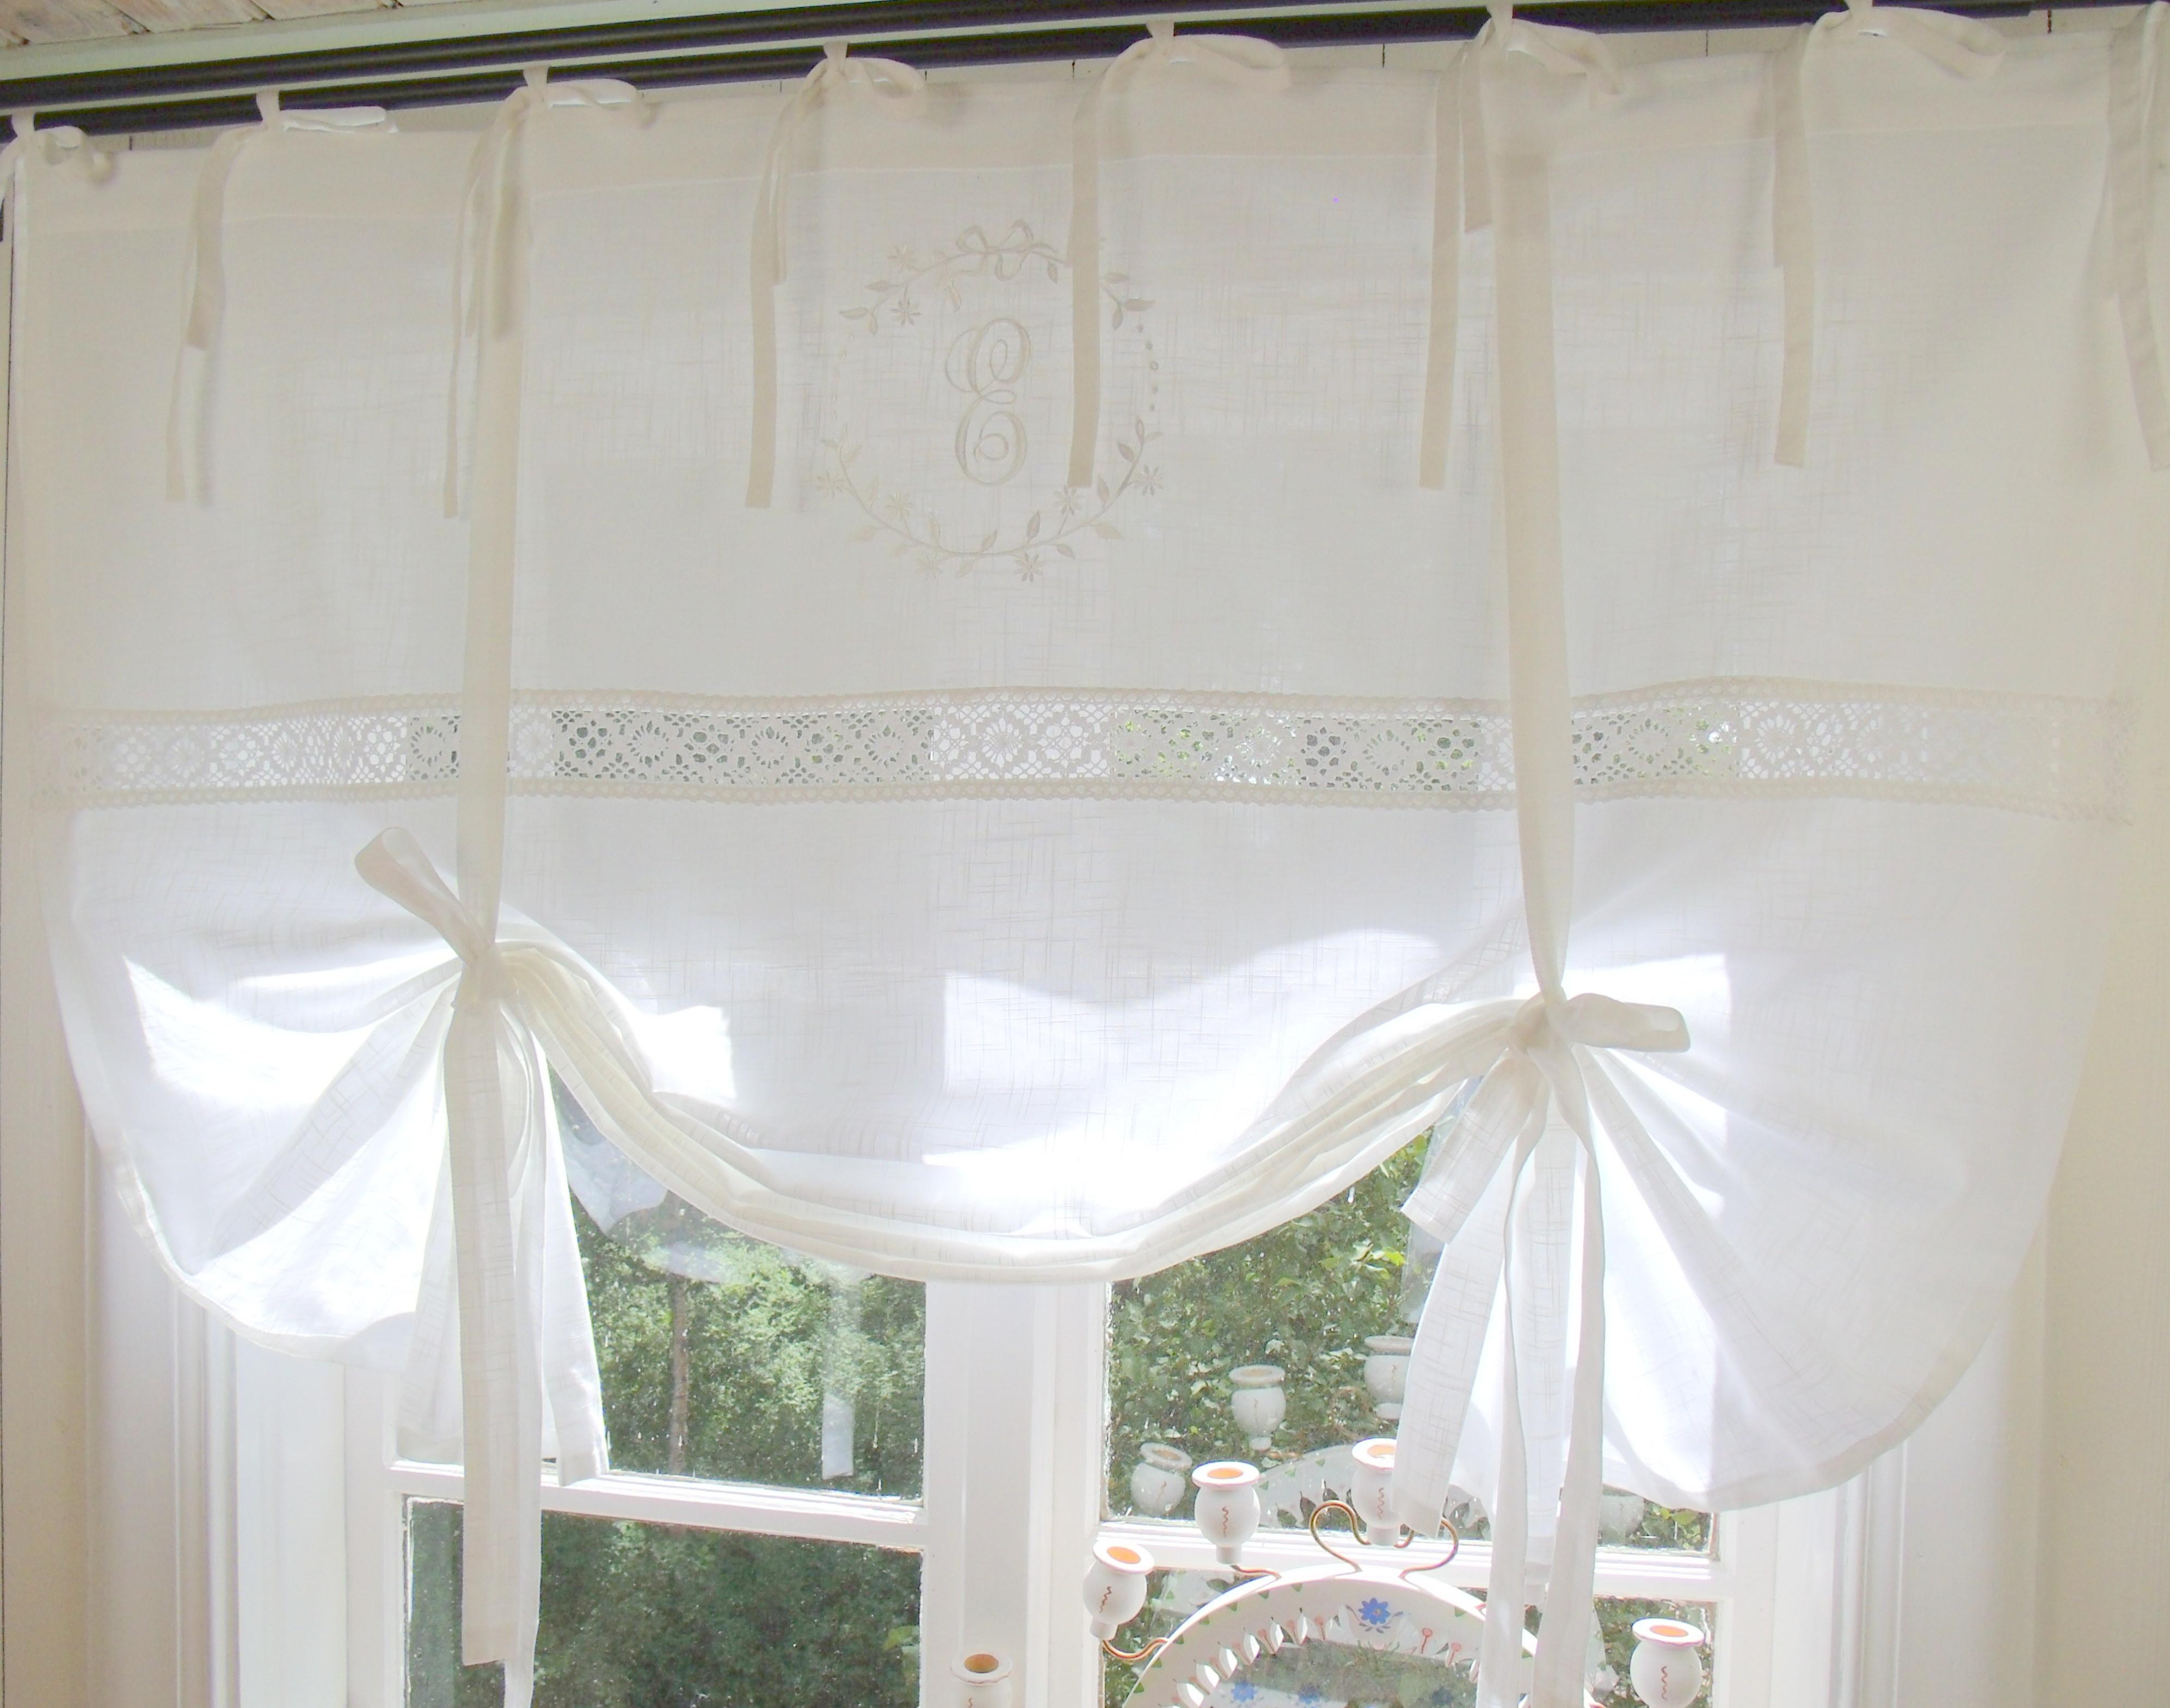 raff gardine emilia wei bestickt 140x120 cm raffgardinen rollos gardinen lillabelle. Black Bedroom Furniture Sets. Home Design Ideas